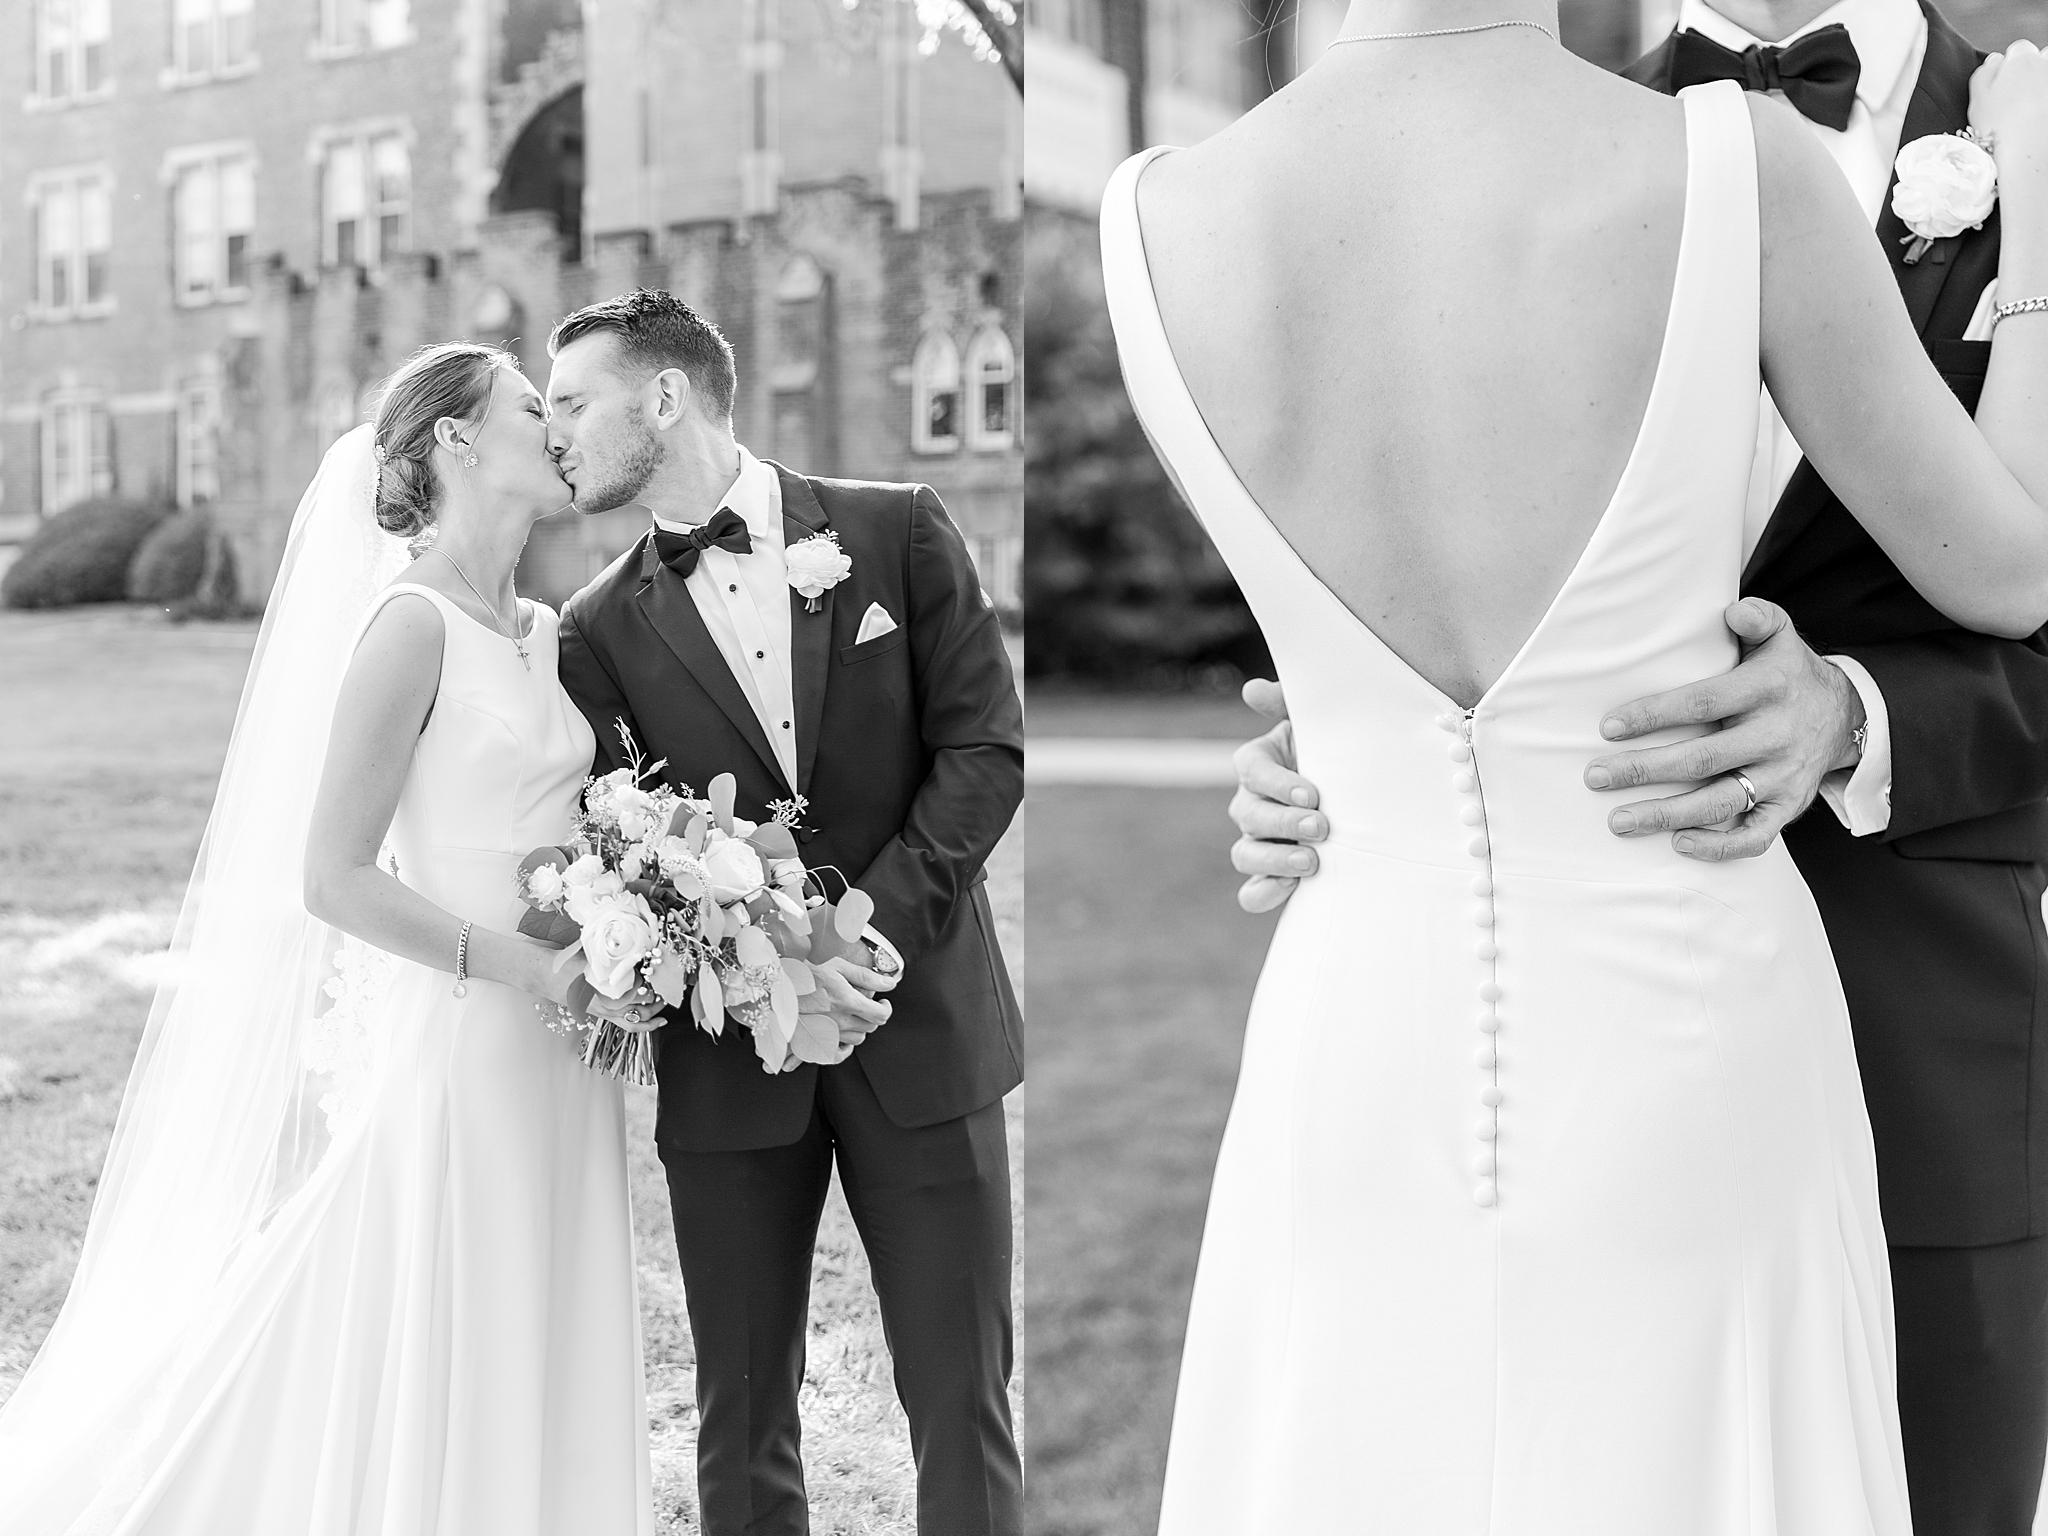 detroit-wedding-photographer-grosse-pointe-academy-chapel-detroit-golf-club-wedding-carly-matt-by-courtney-carolyn-photography_0063.jpg